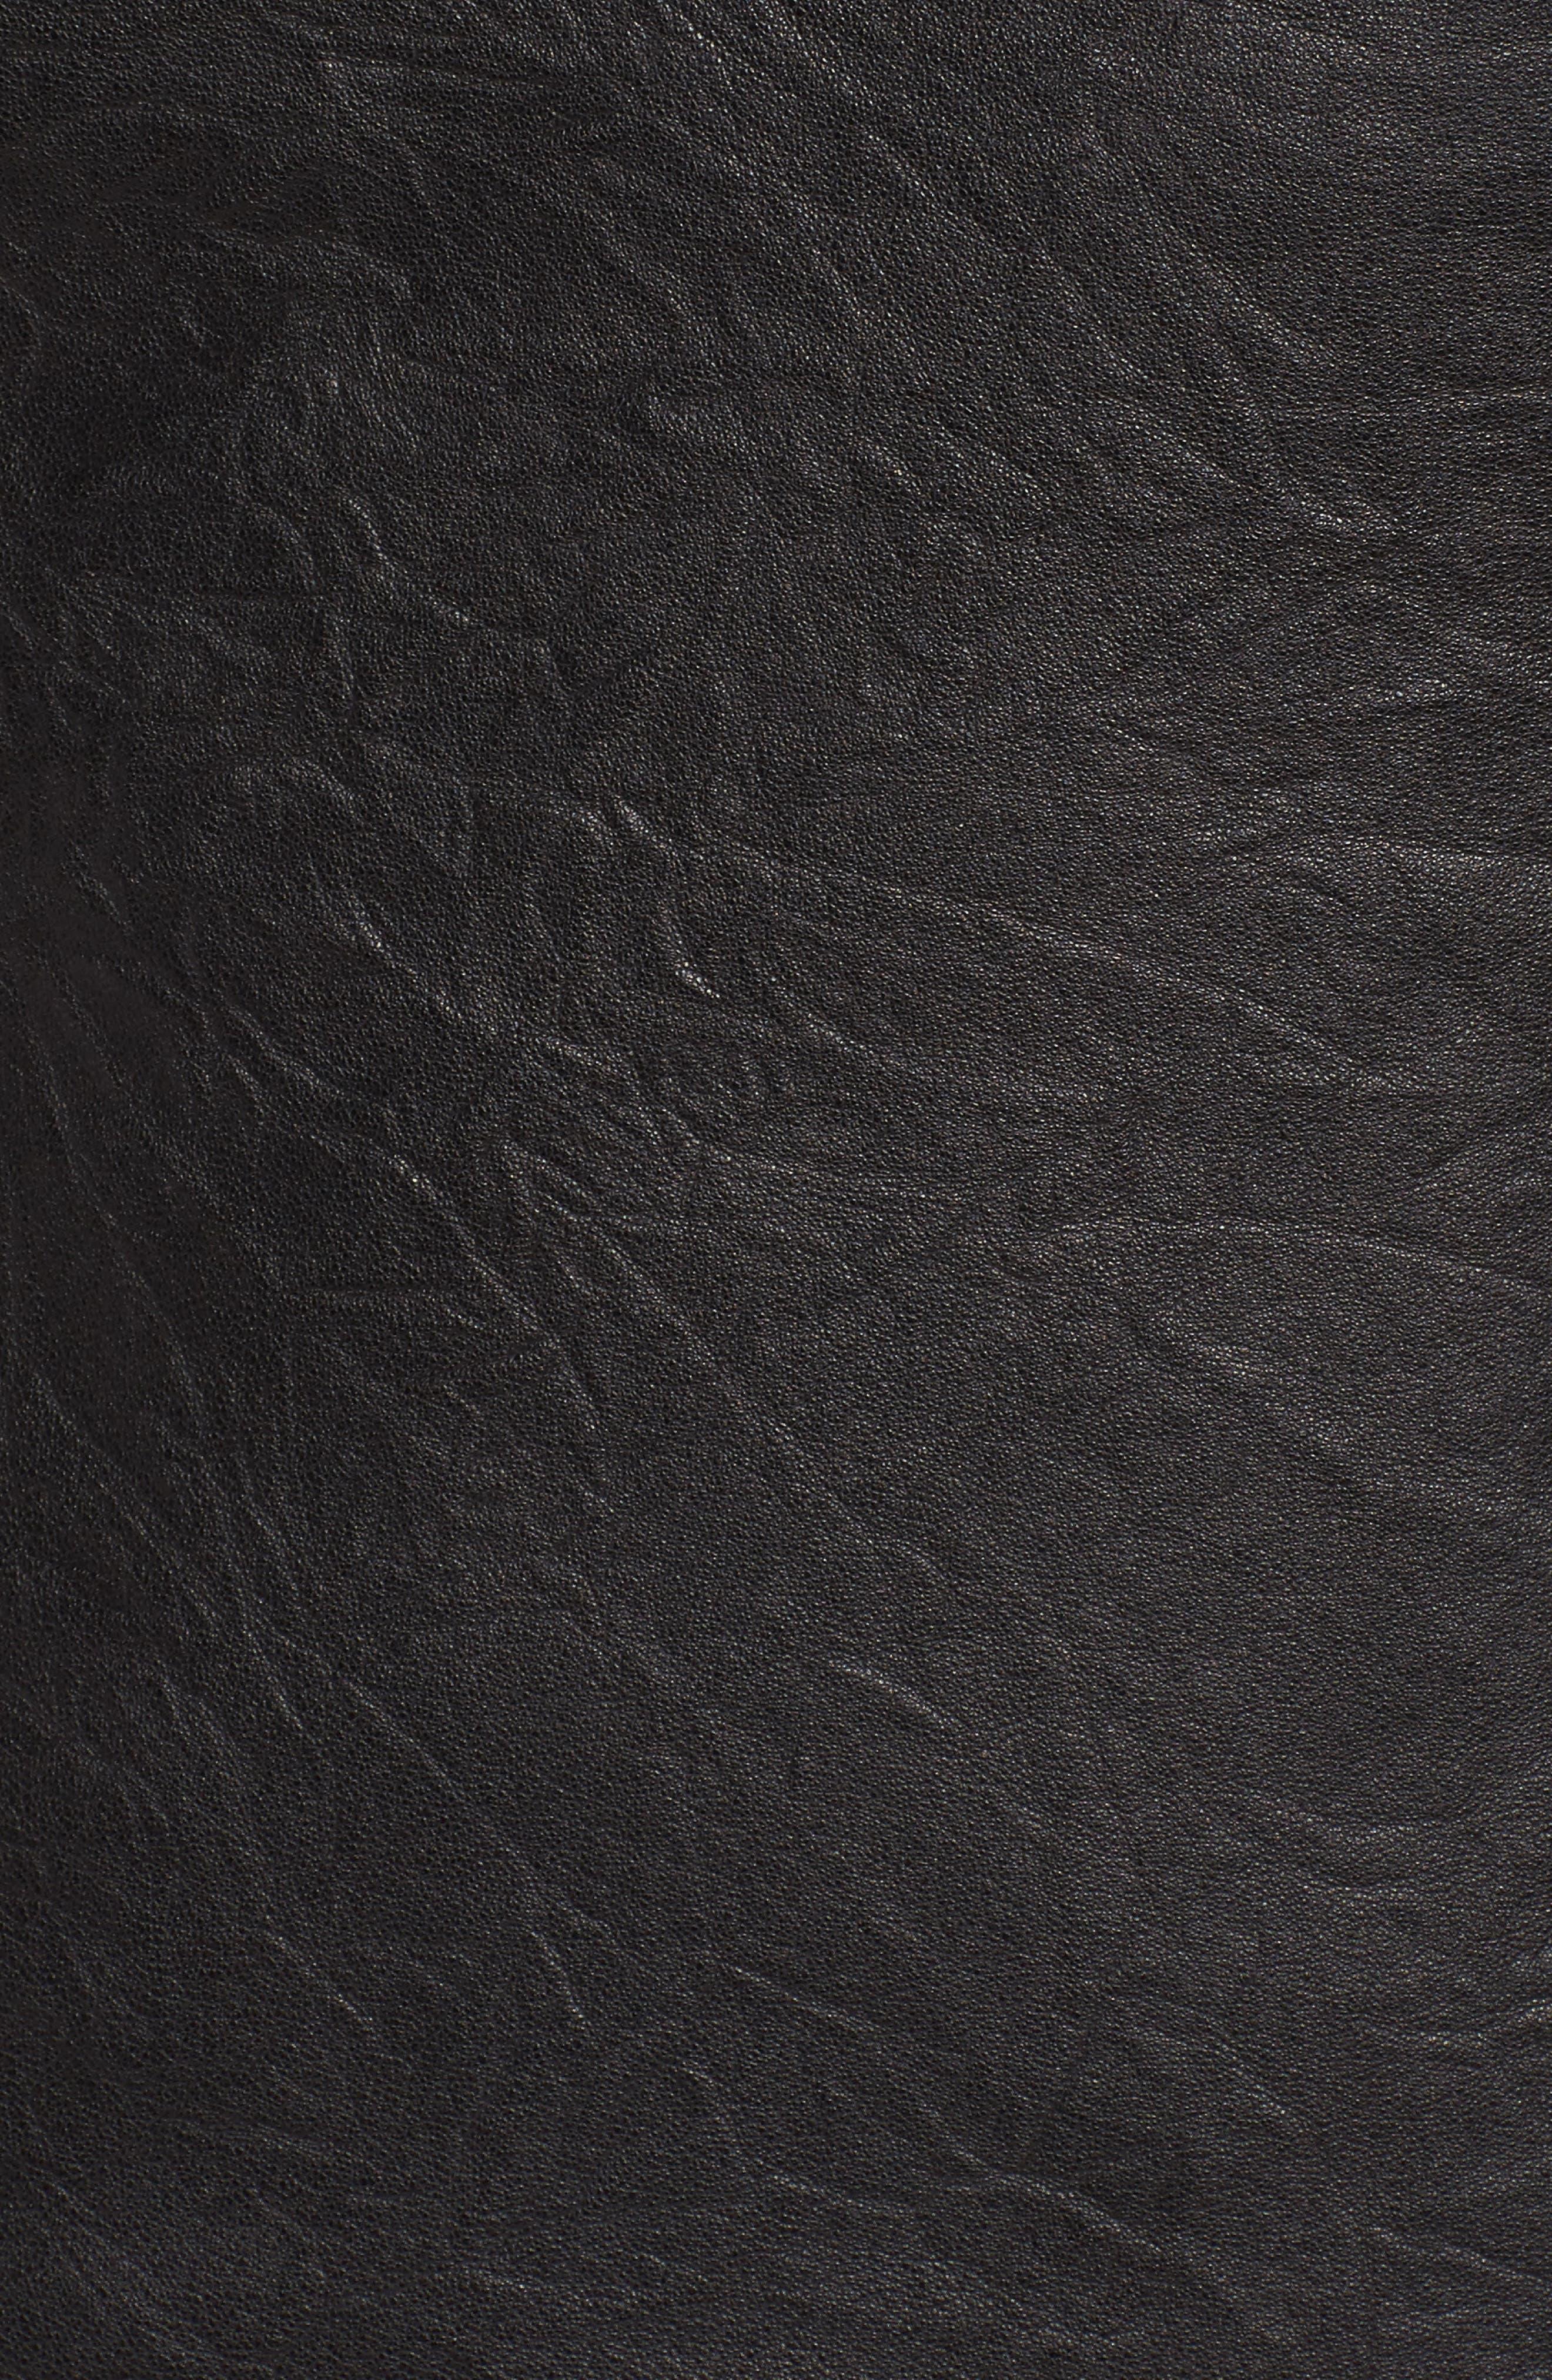 Aimes Leather Jacket,                             Alternate thumbnail 5, color,                             Black